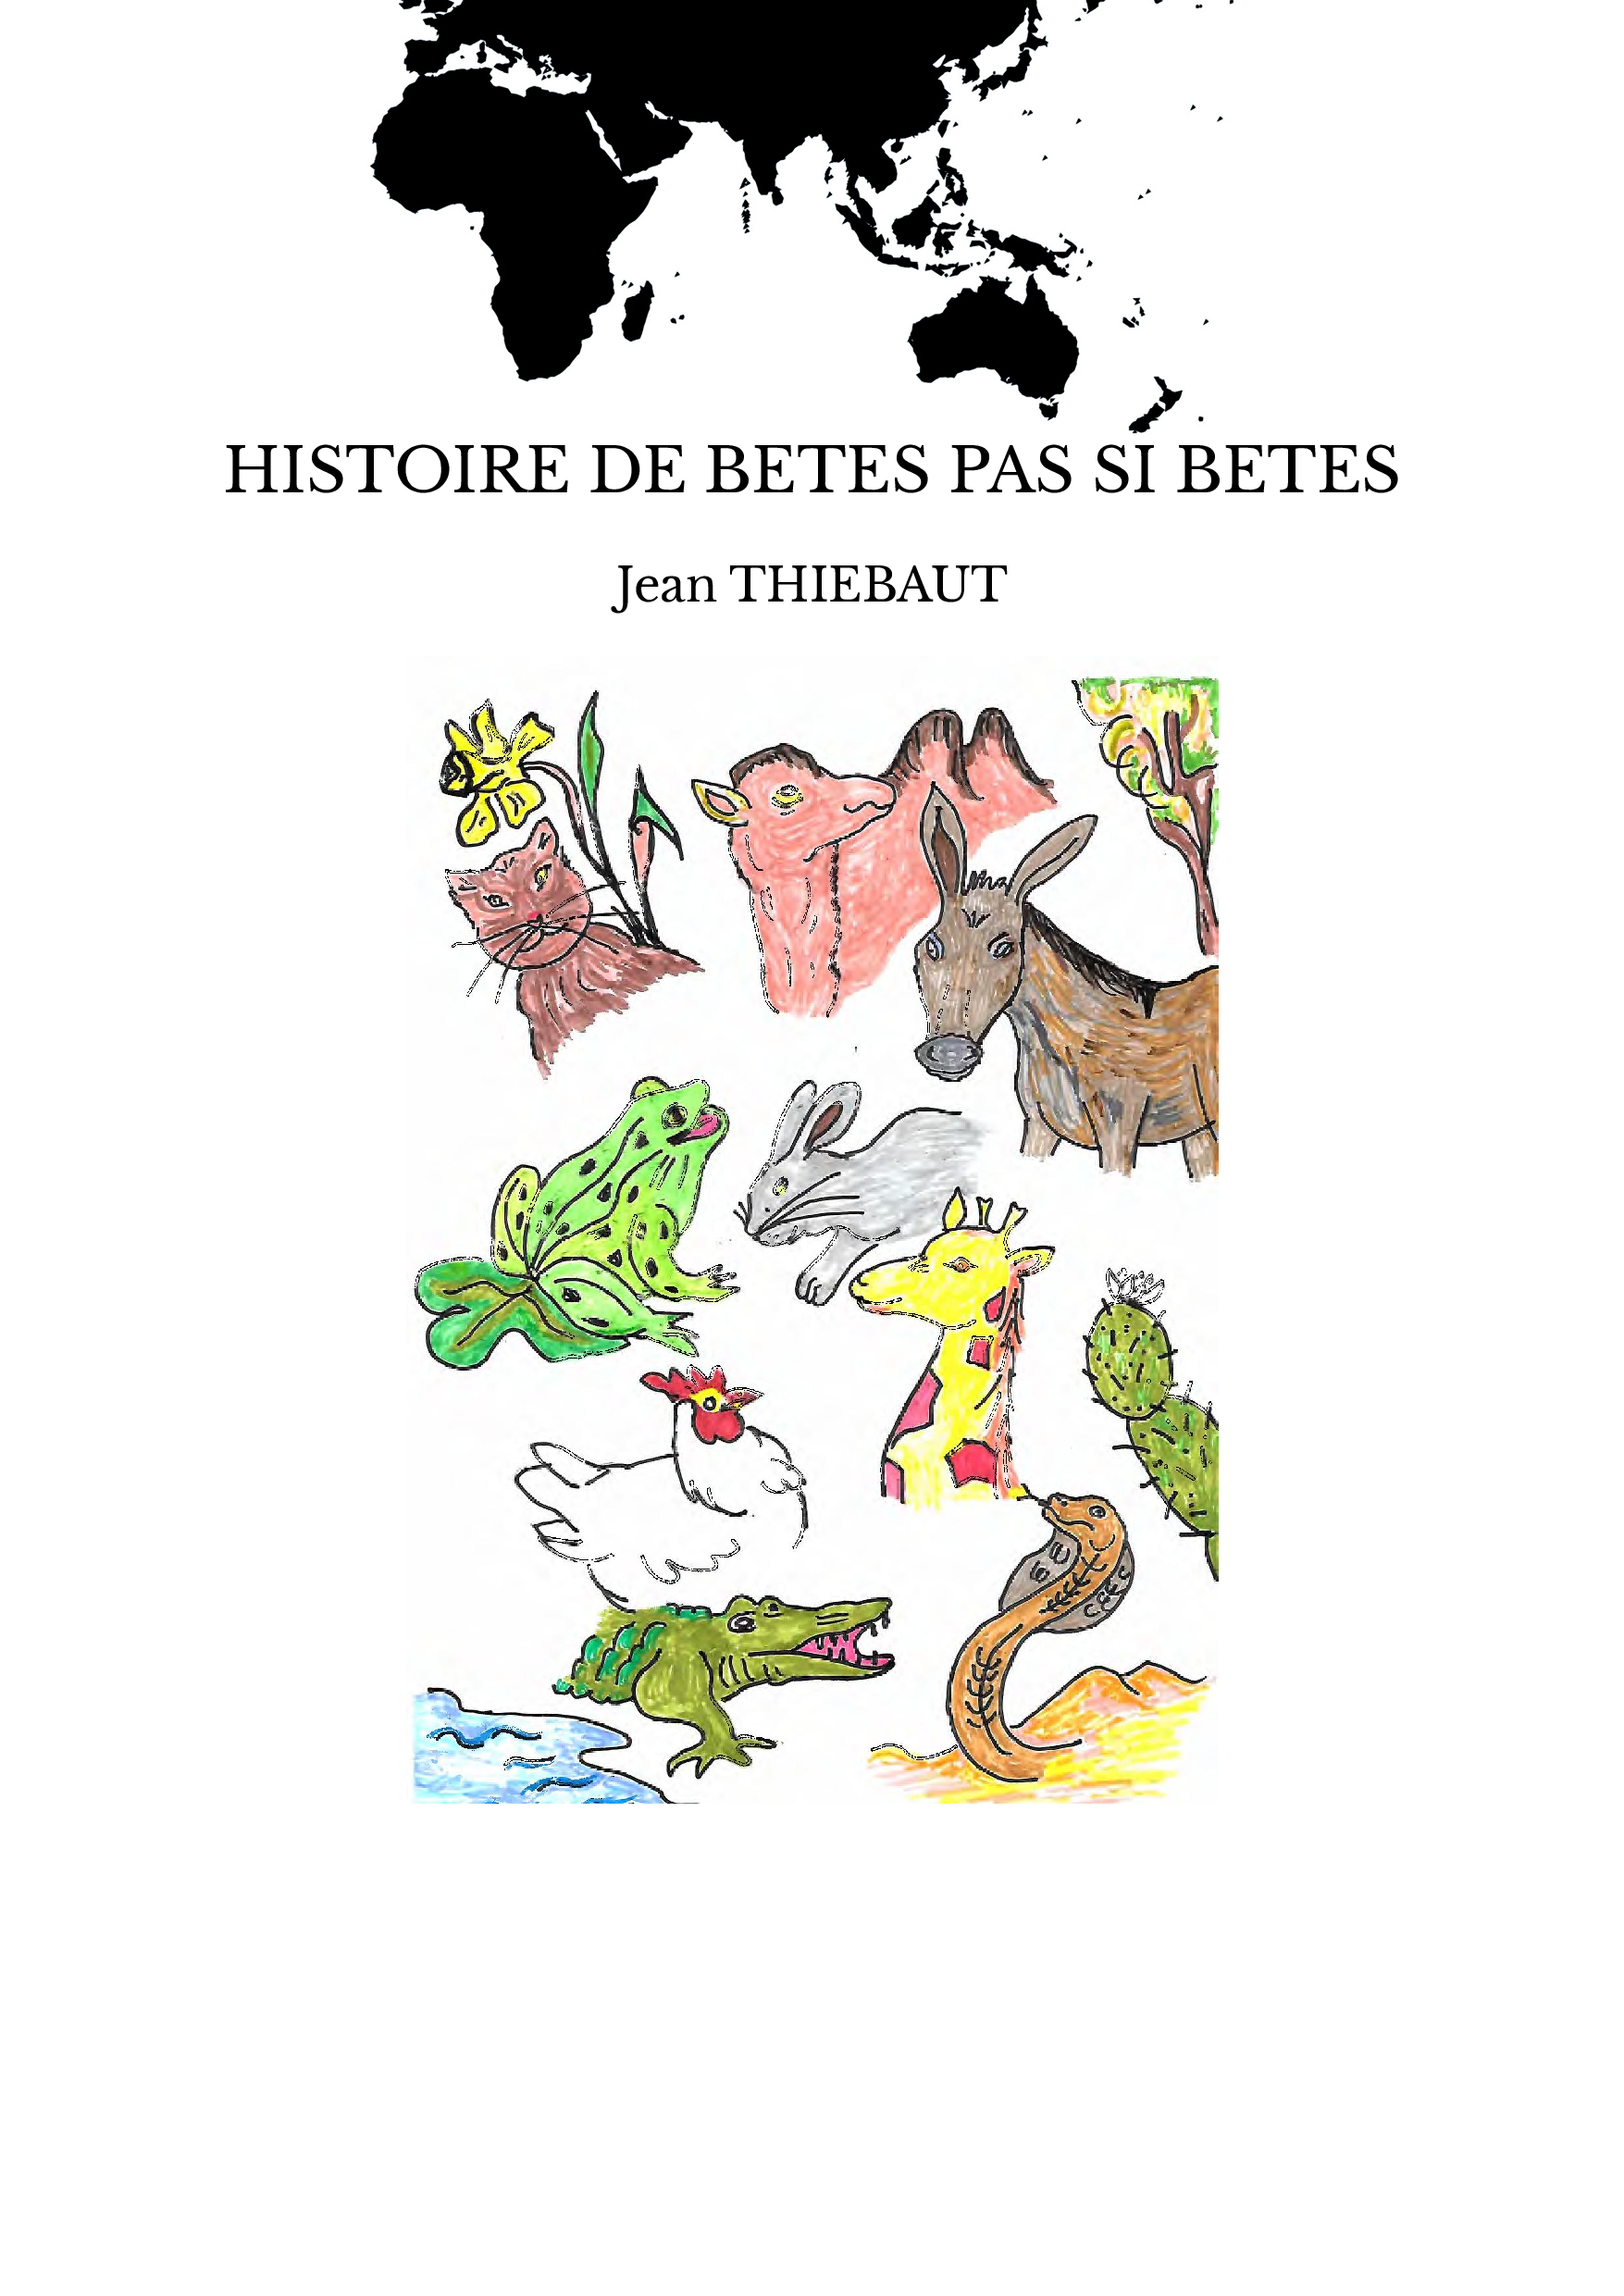 HISTOIRE DE BETES PAS SI BETES